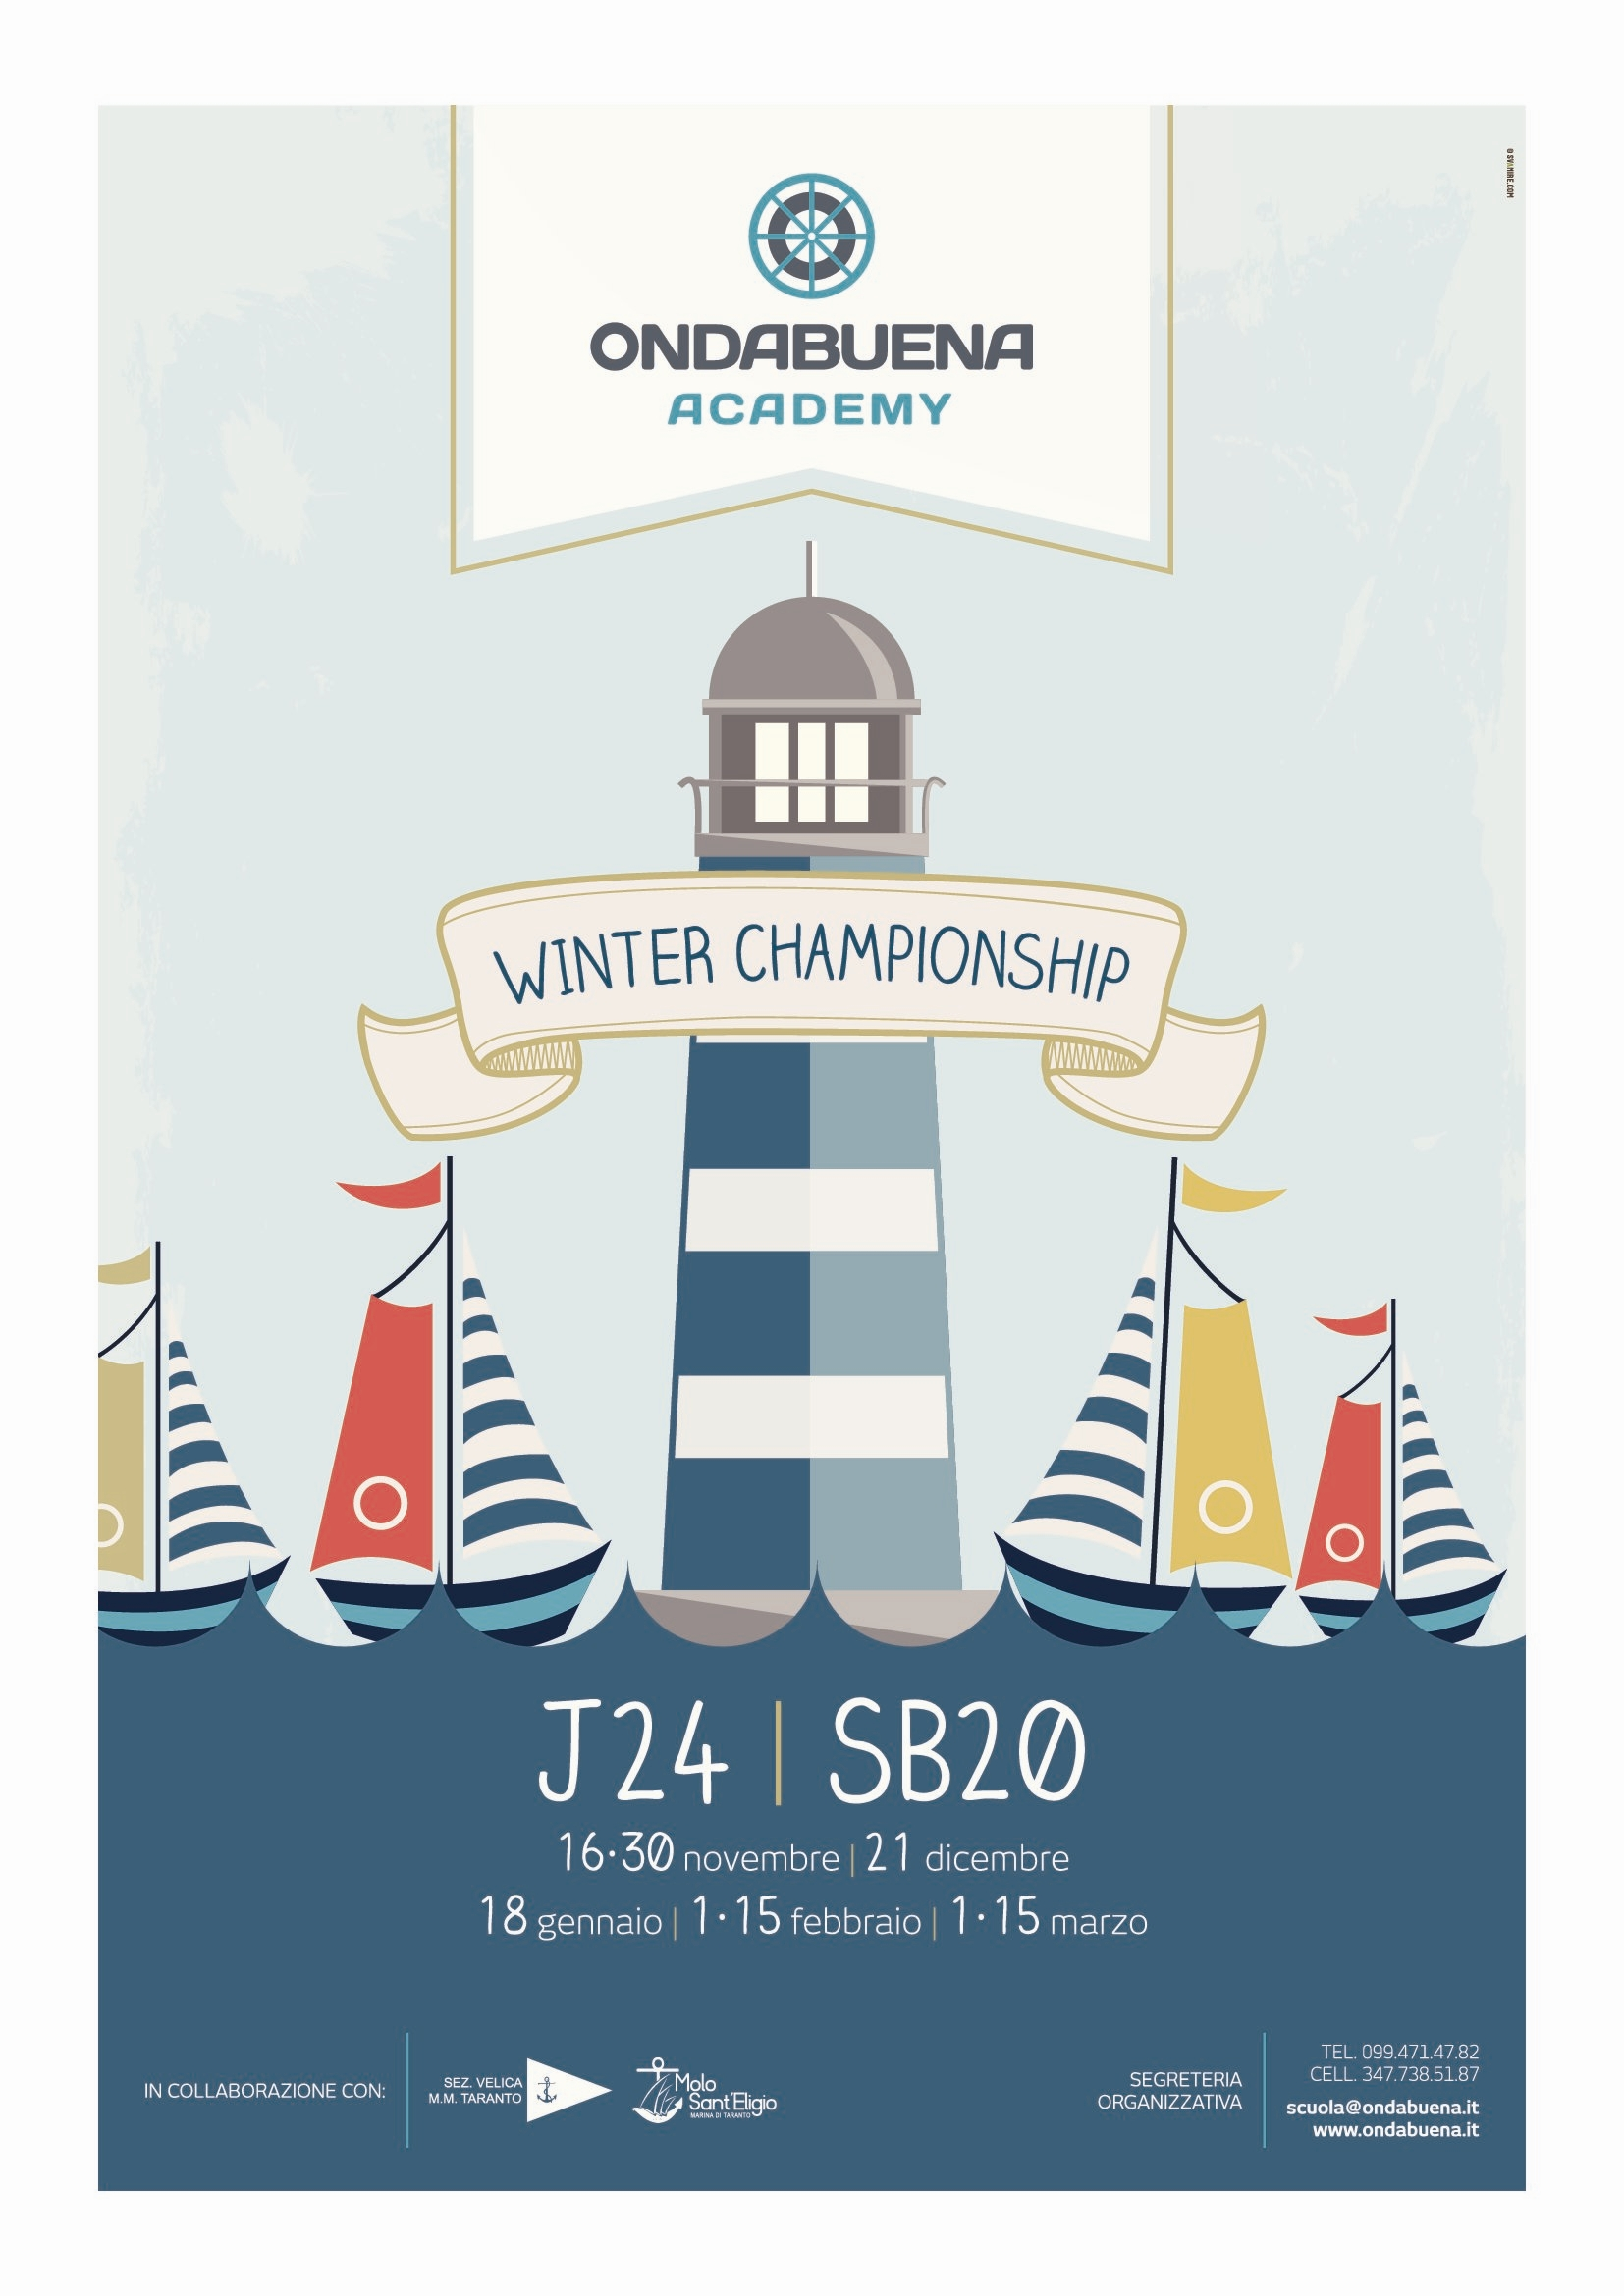 CampionatoInvernale_2014_A4_1_